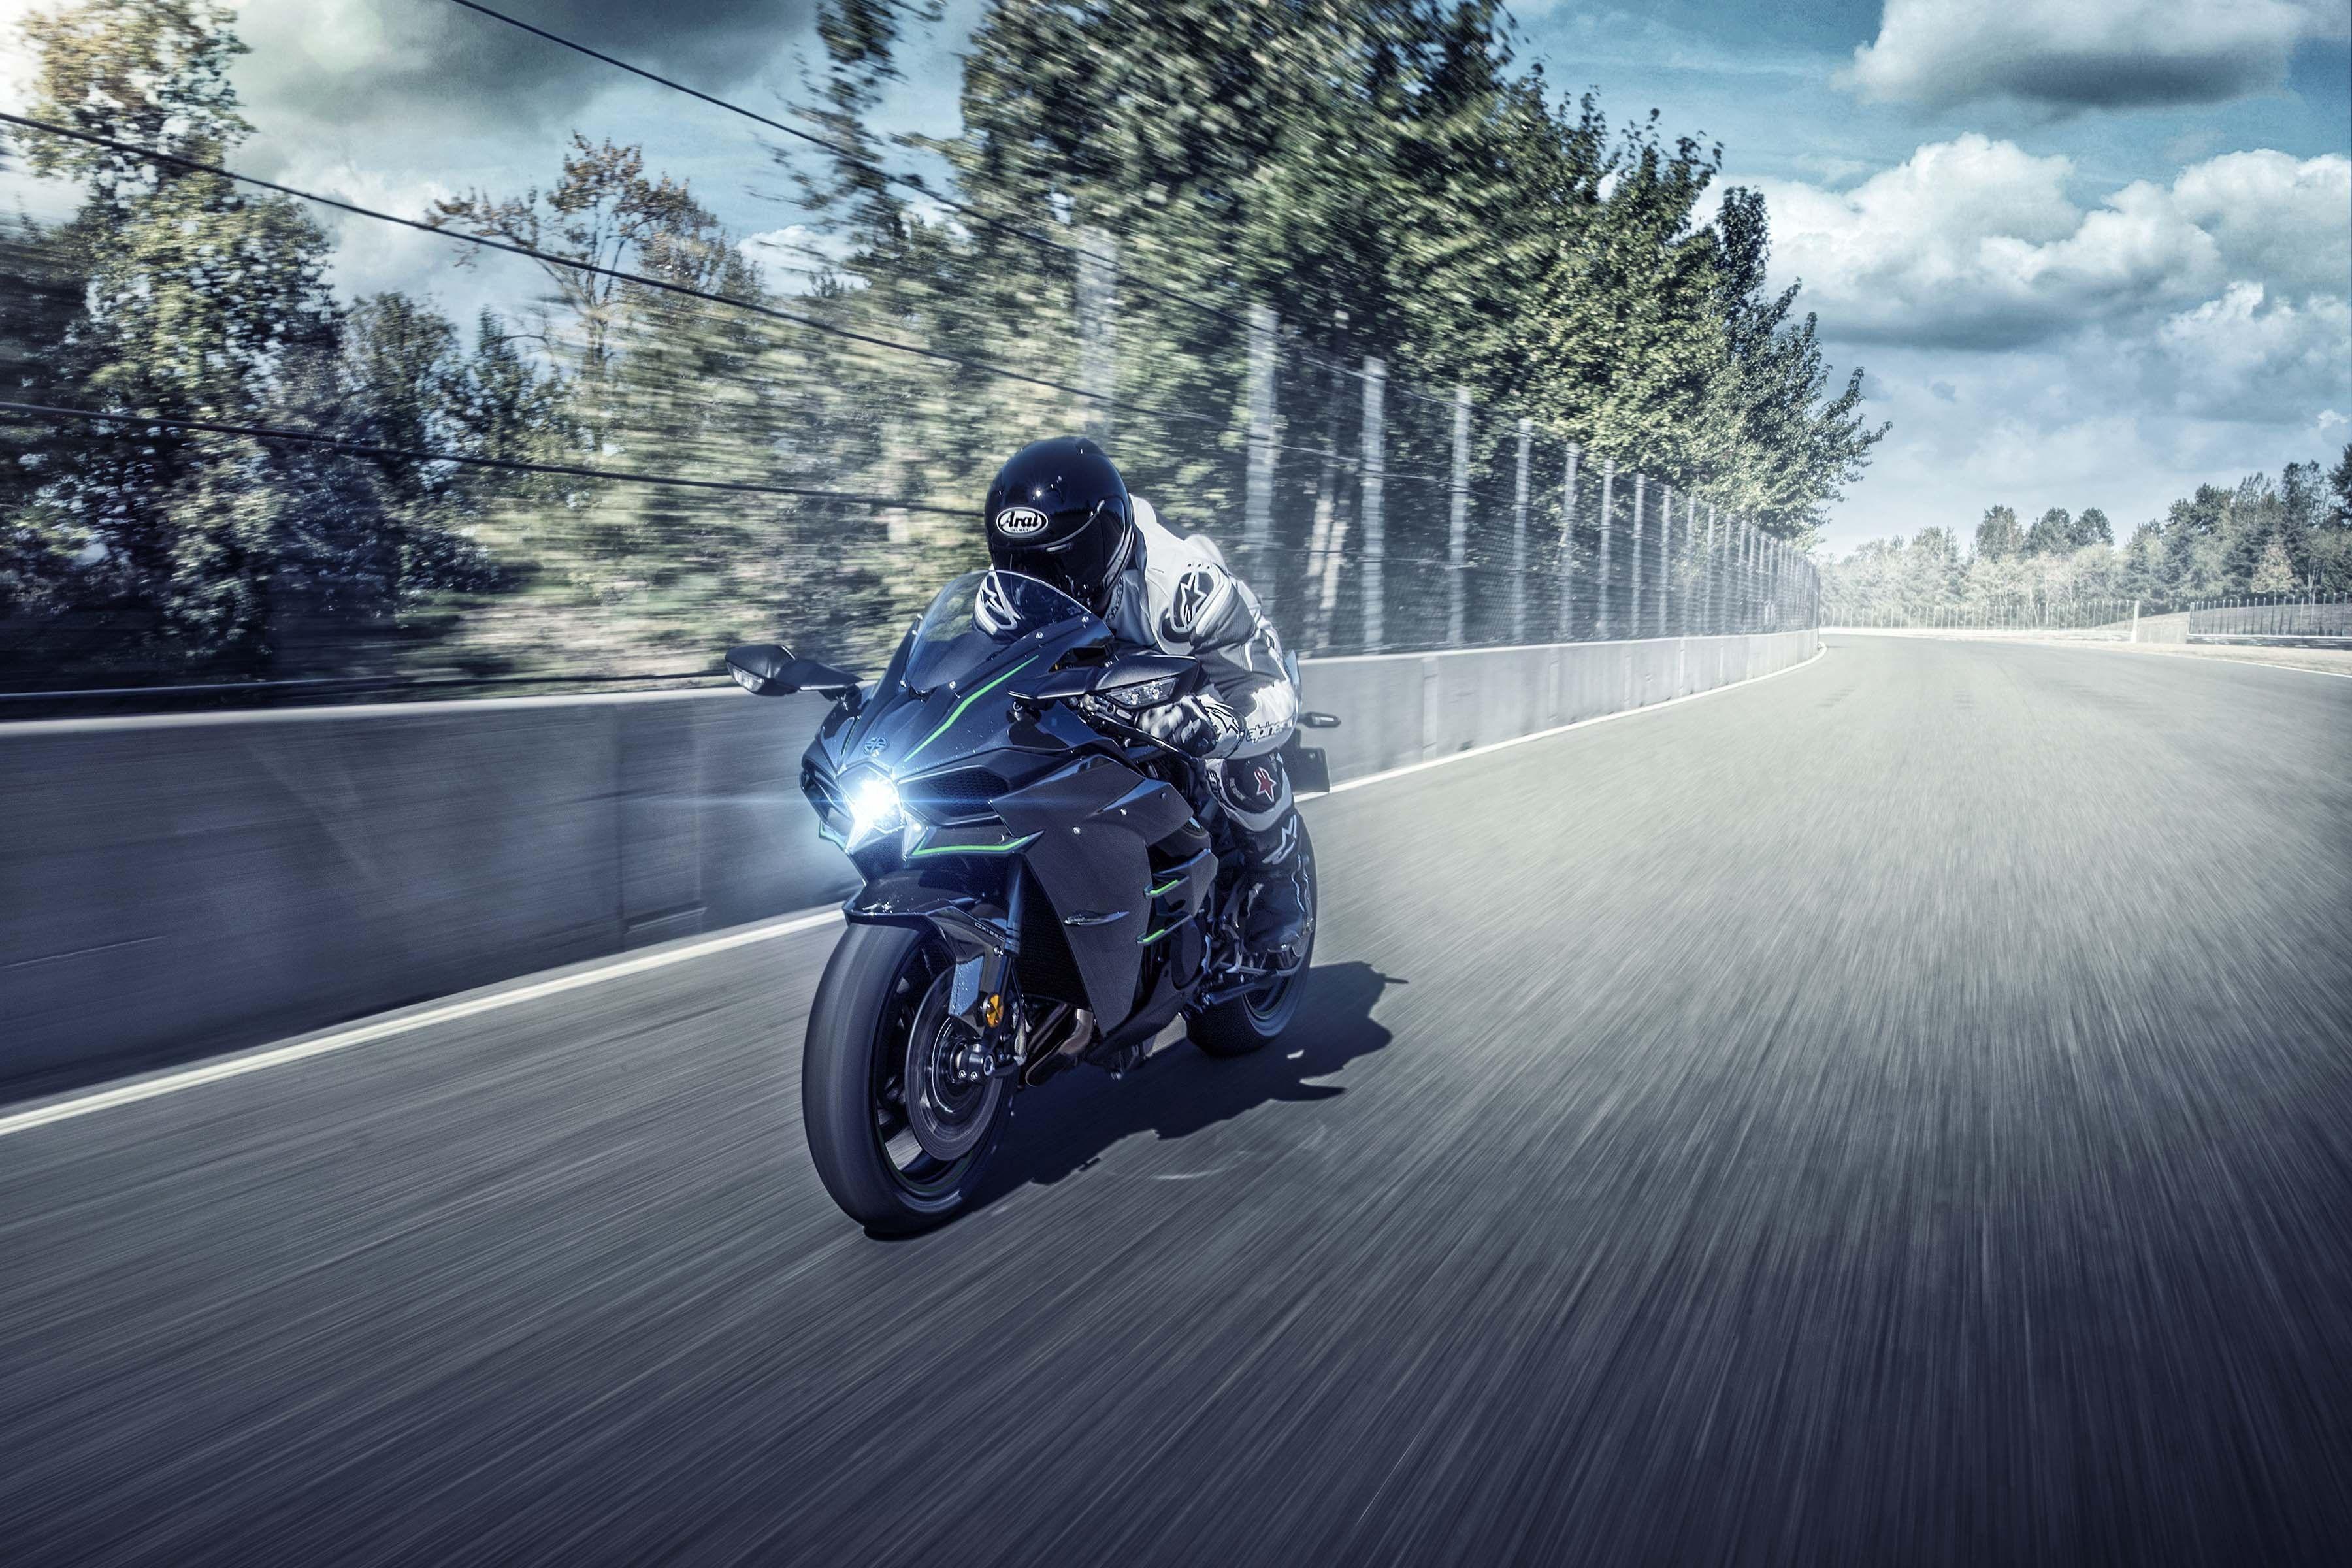 2019 Kawasaki Ninja H2 H2 Carbon Kawasaki Ninja Racing Bikes